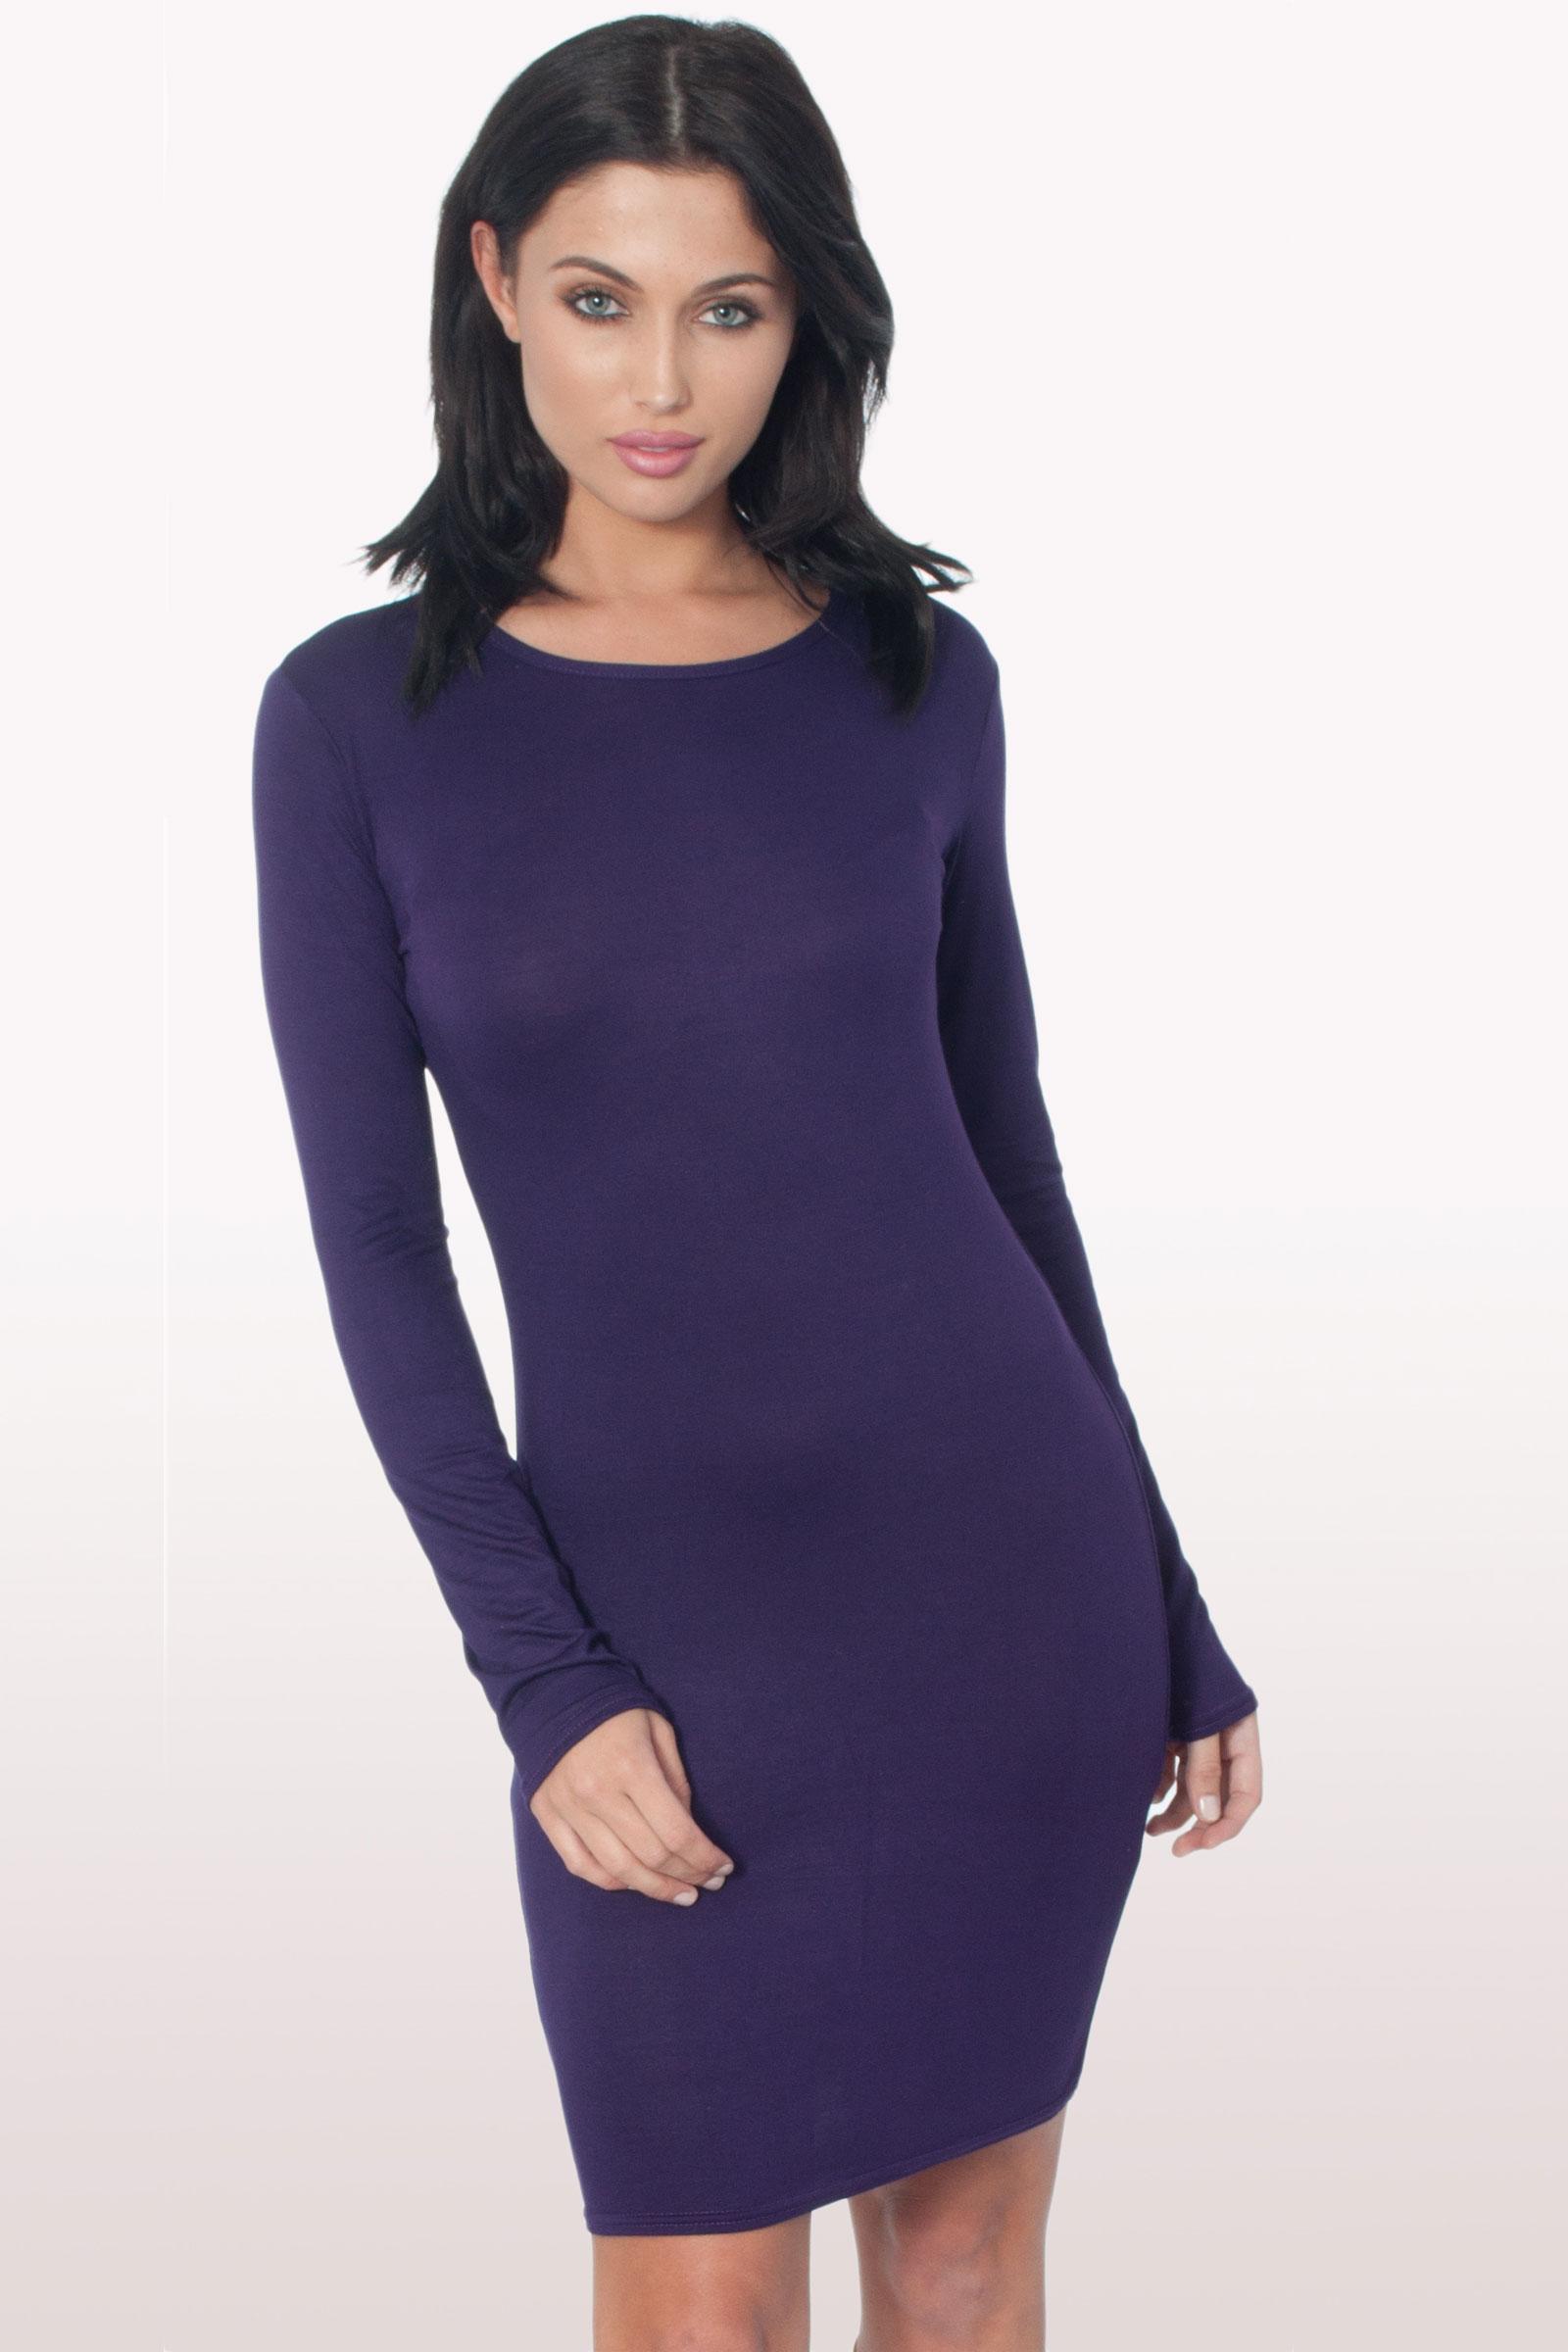 7 3 bodycon dresses sleeve long download zozo